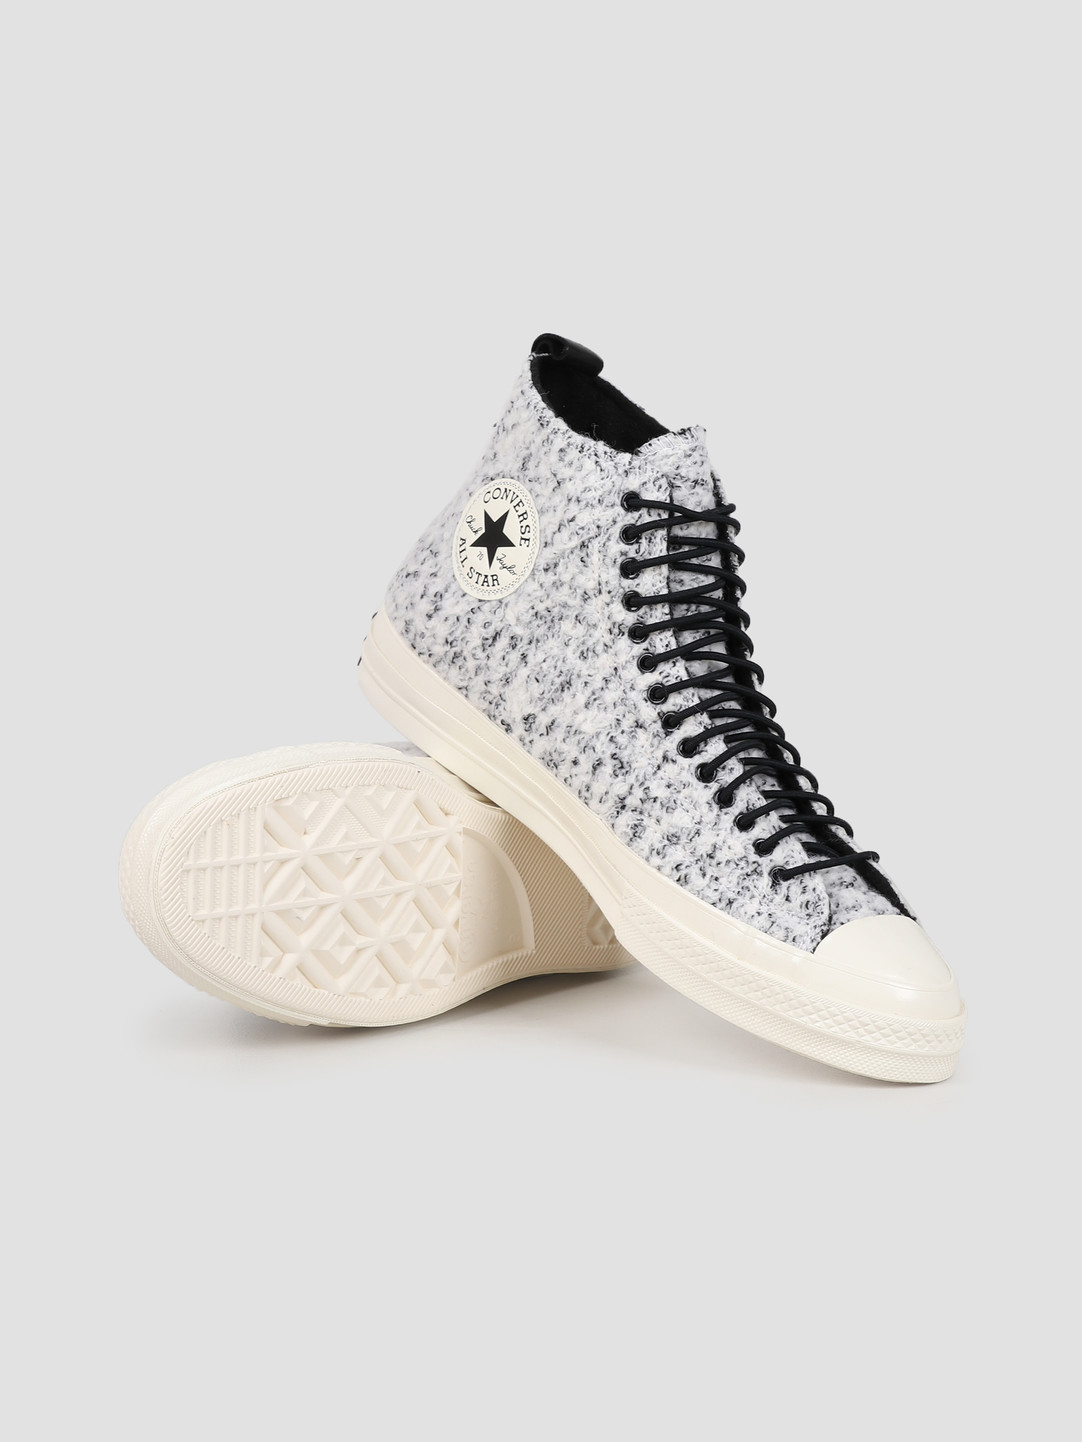 Converse Converse Chuck 70 HI White Black Egret 166132C